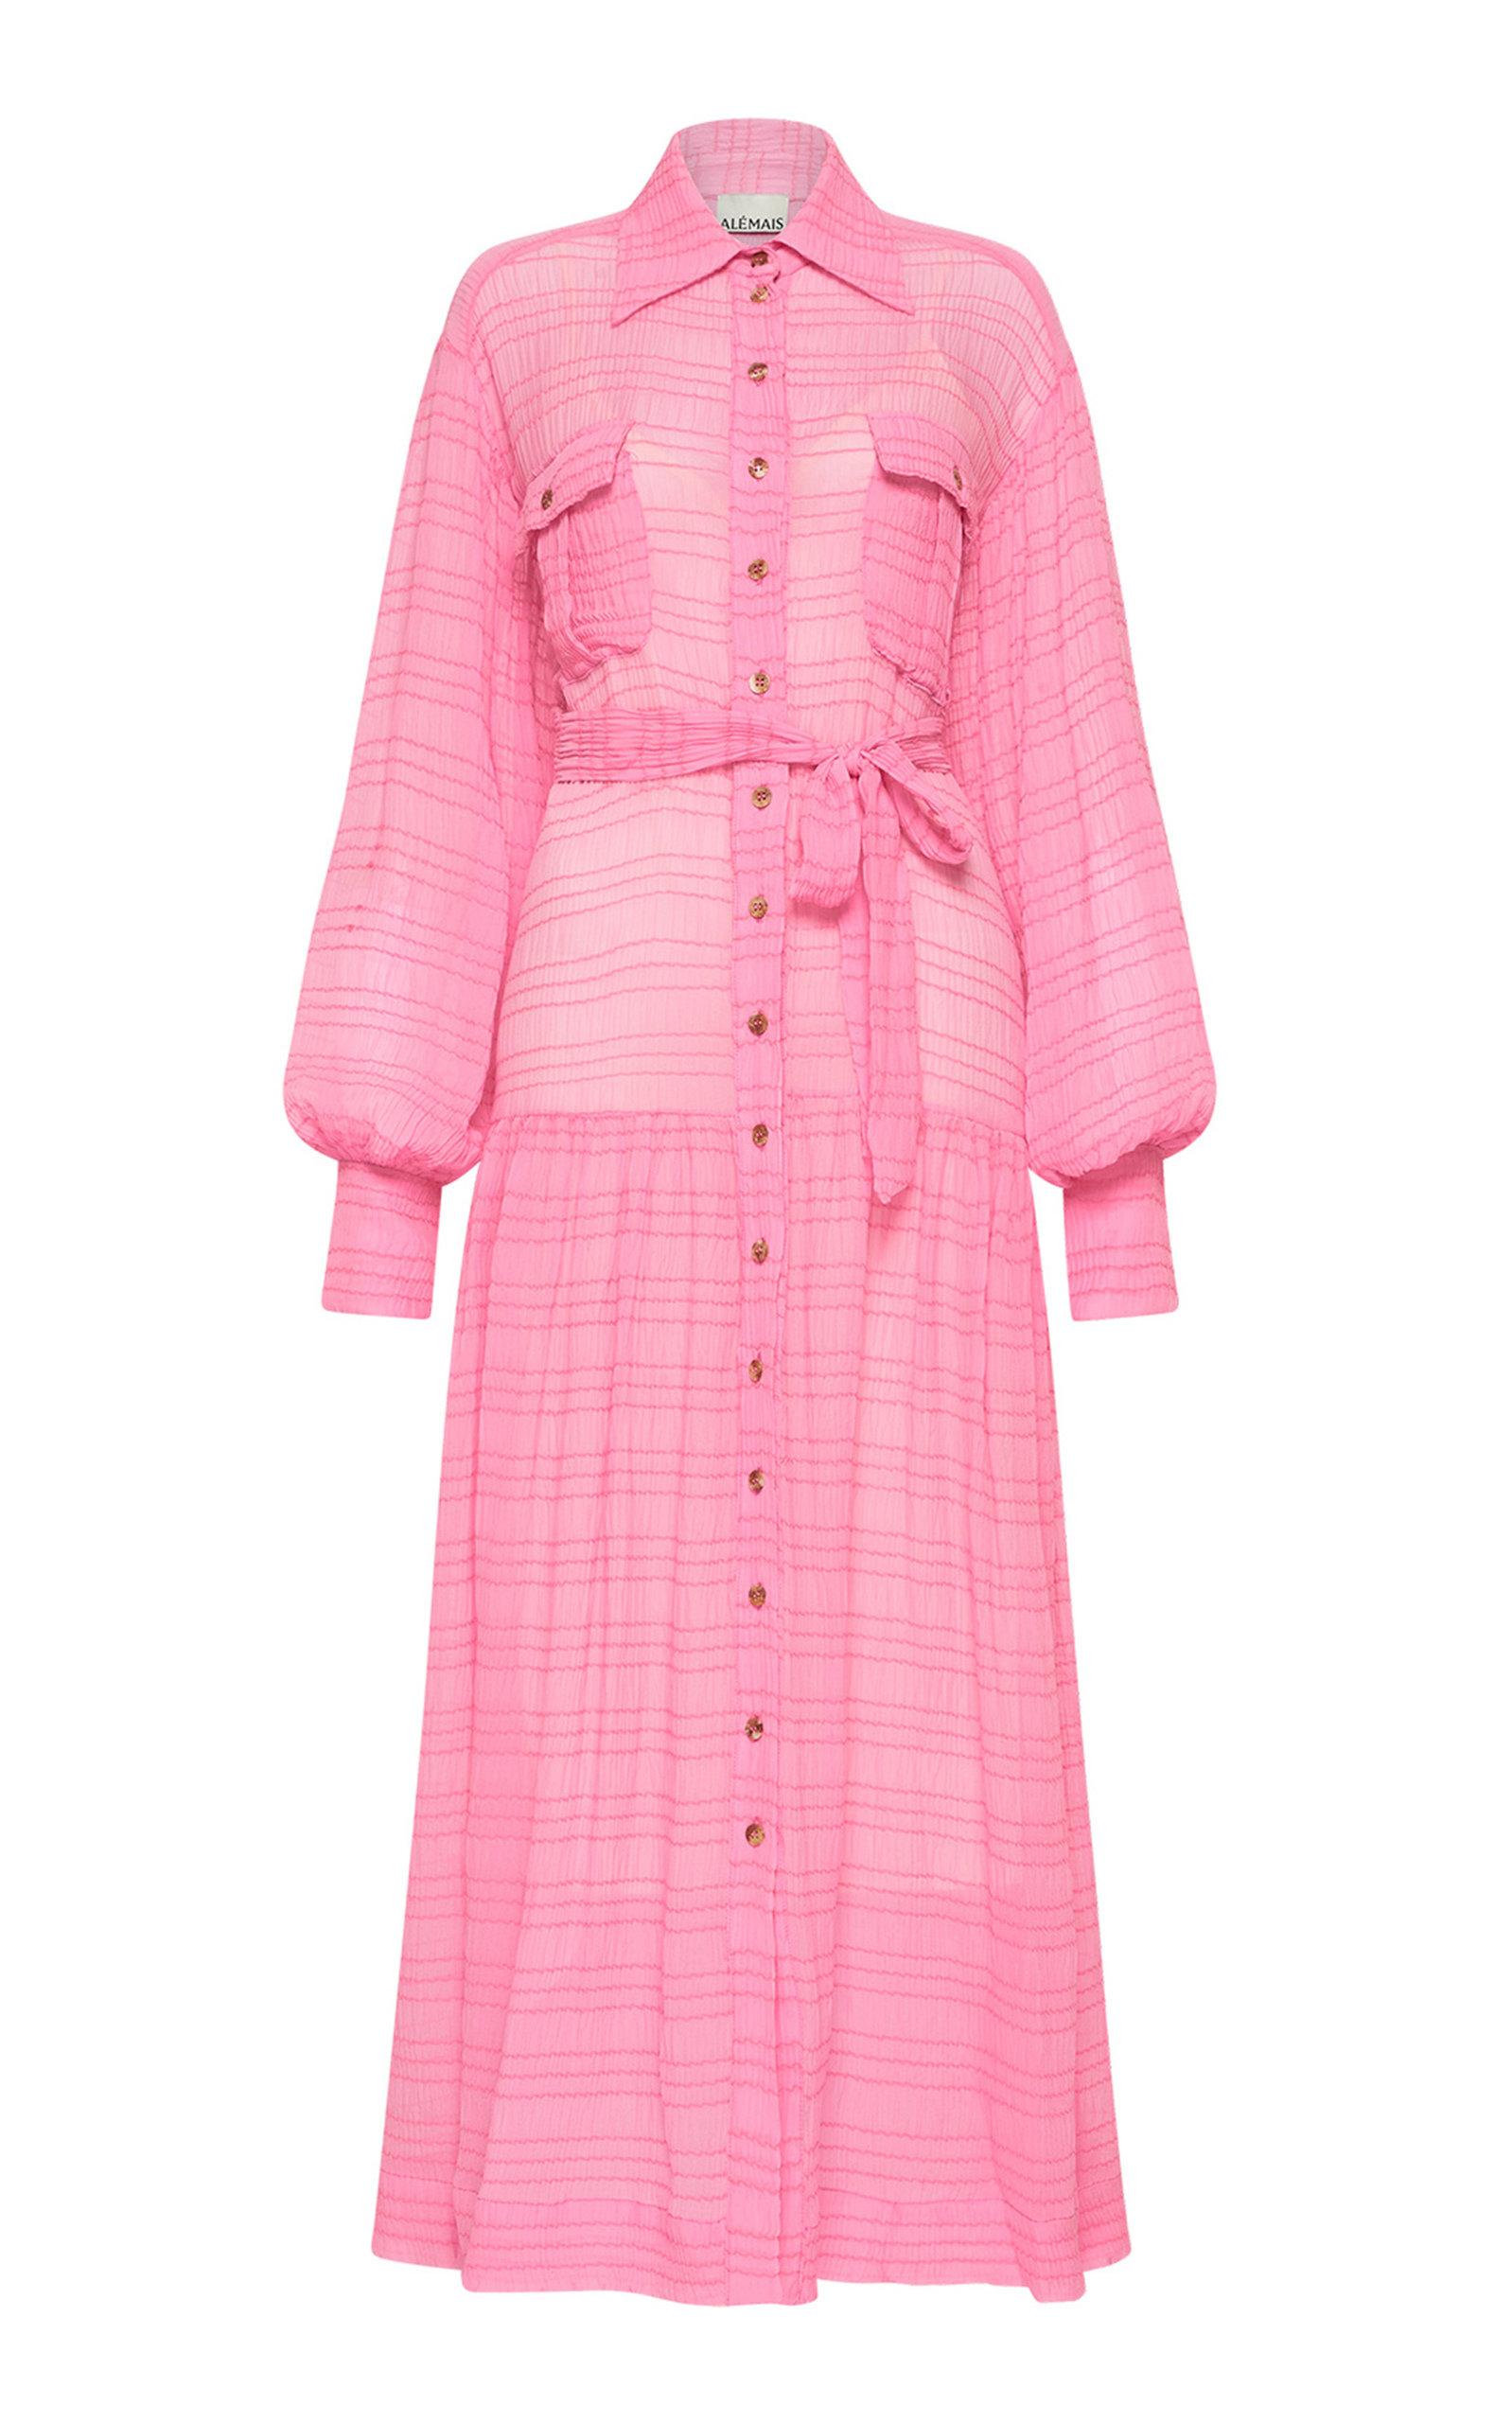 ALÉMAIS - Women's Antonella Collared Silk-Cotton Shirt Dress - Pink - Moda Operandi